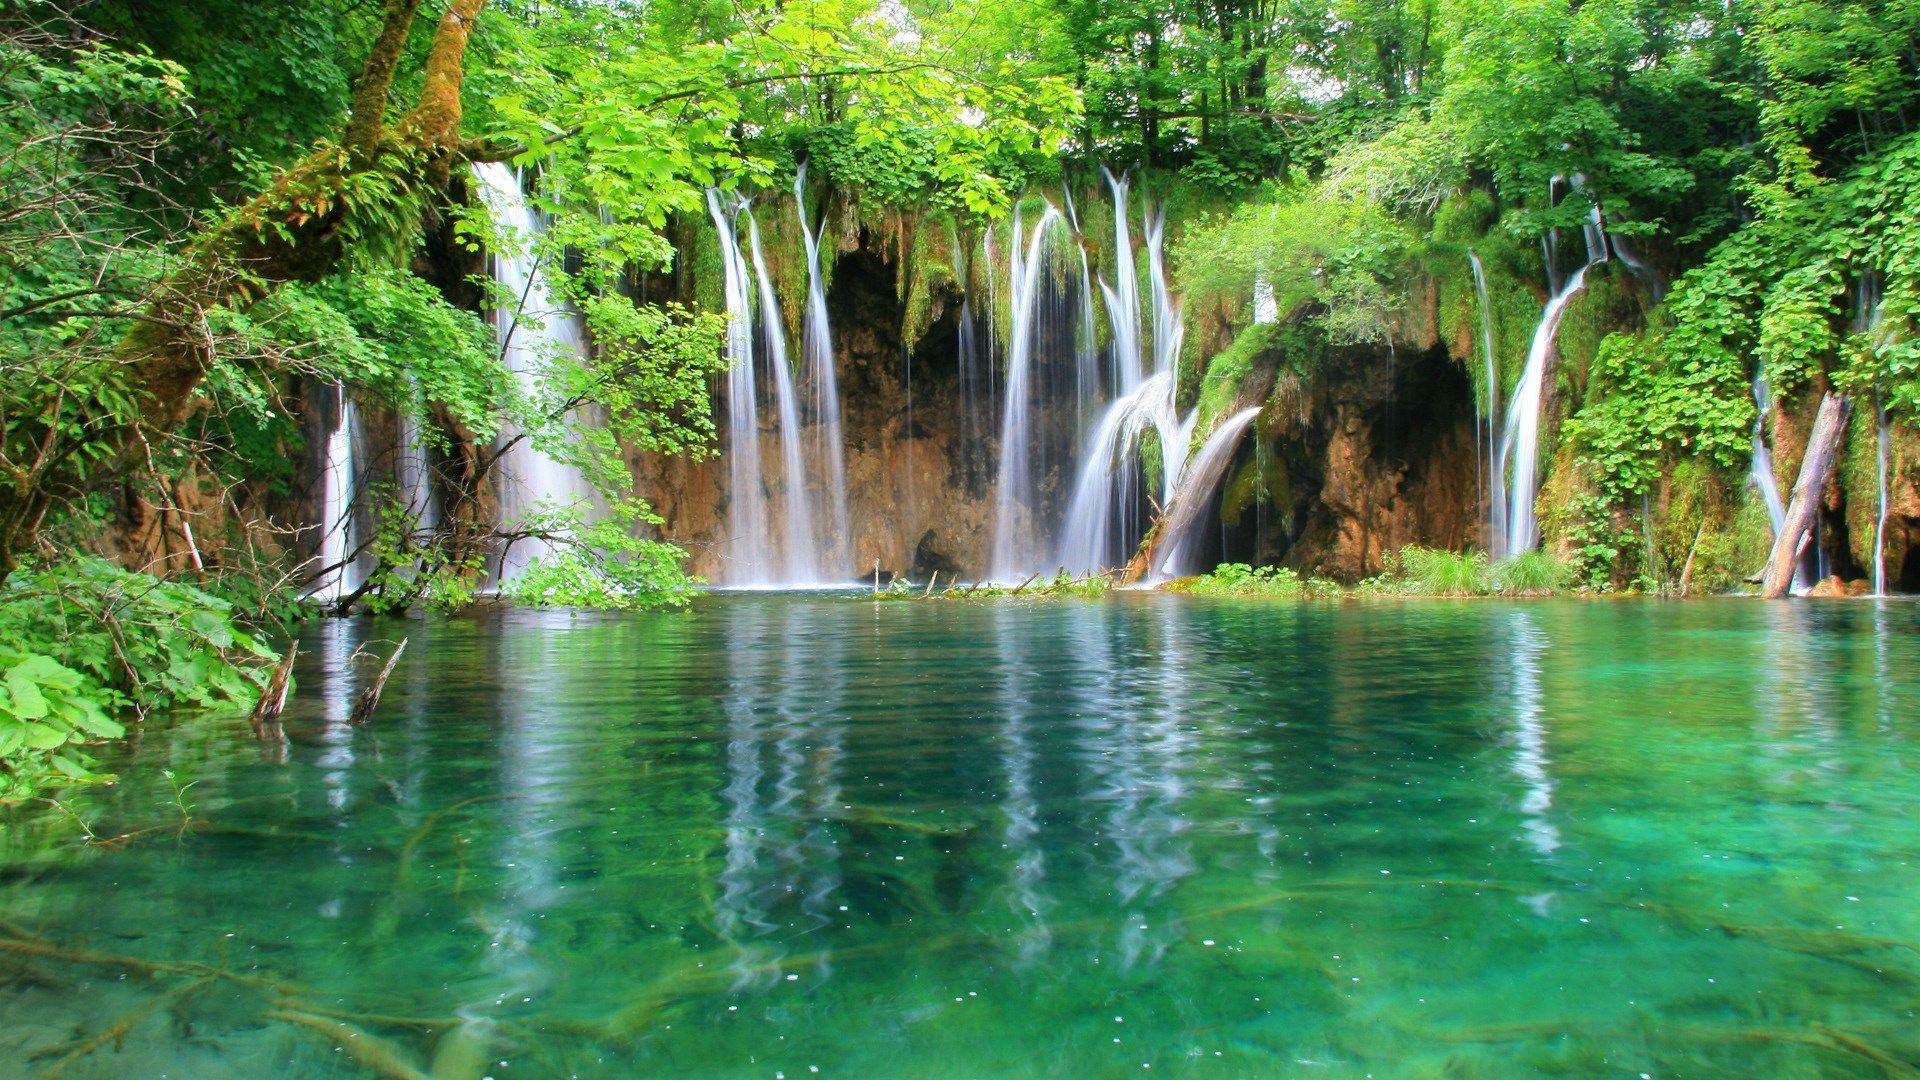 Waterfall Wallpaper Free Desktop Wallpapers Beautiful Vacation Spots Plitvice Lakes National Park Waterfall Wallpaper